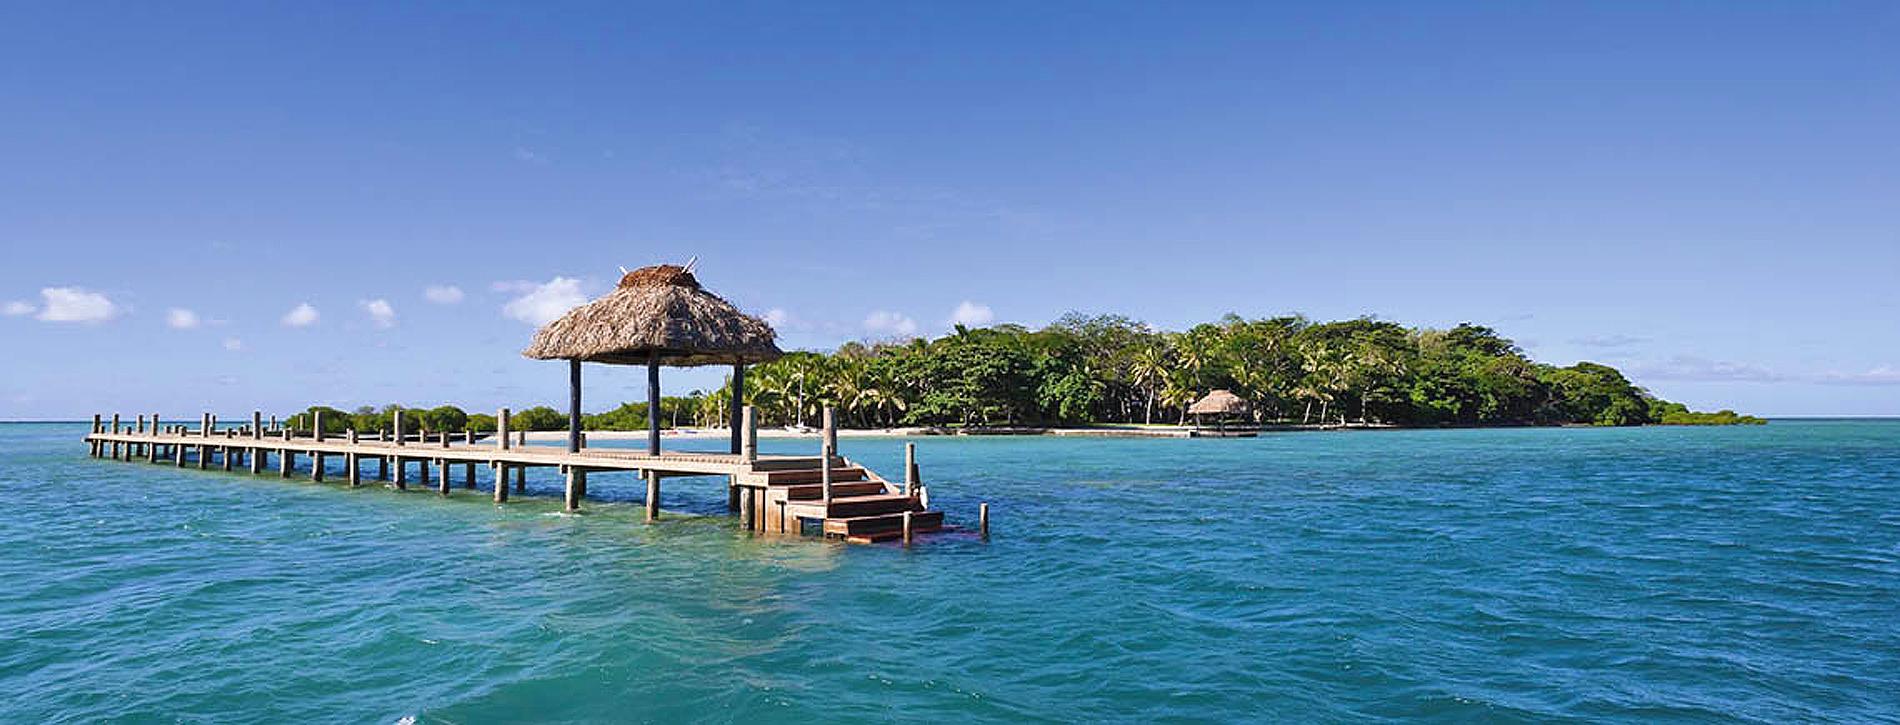 dolphin-island-resort-fiji